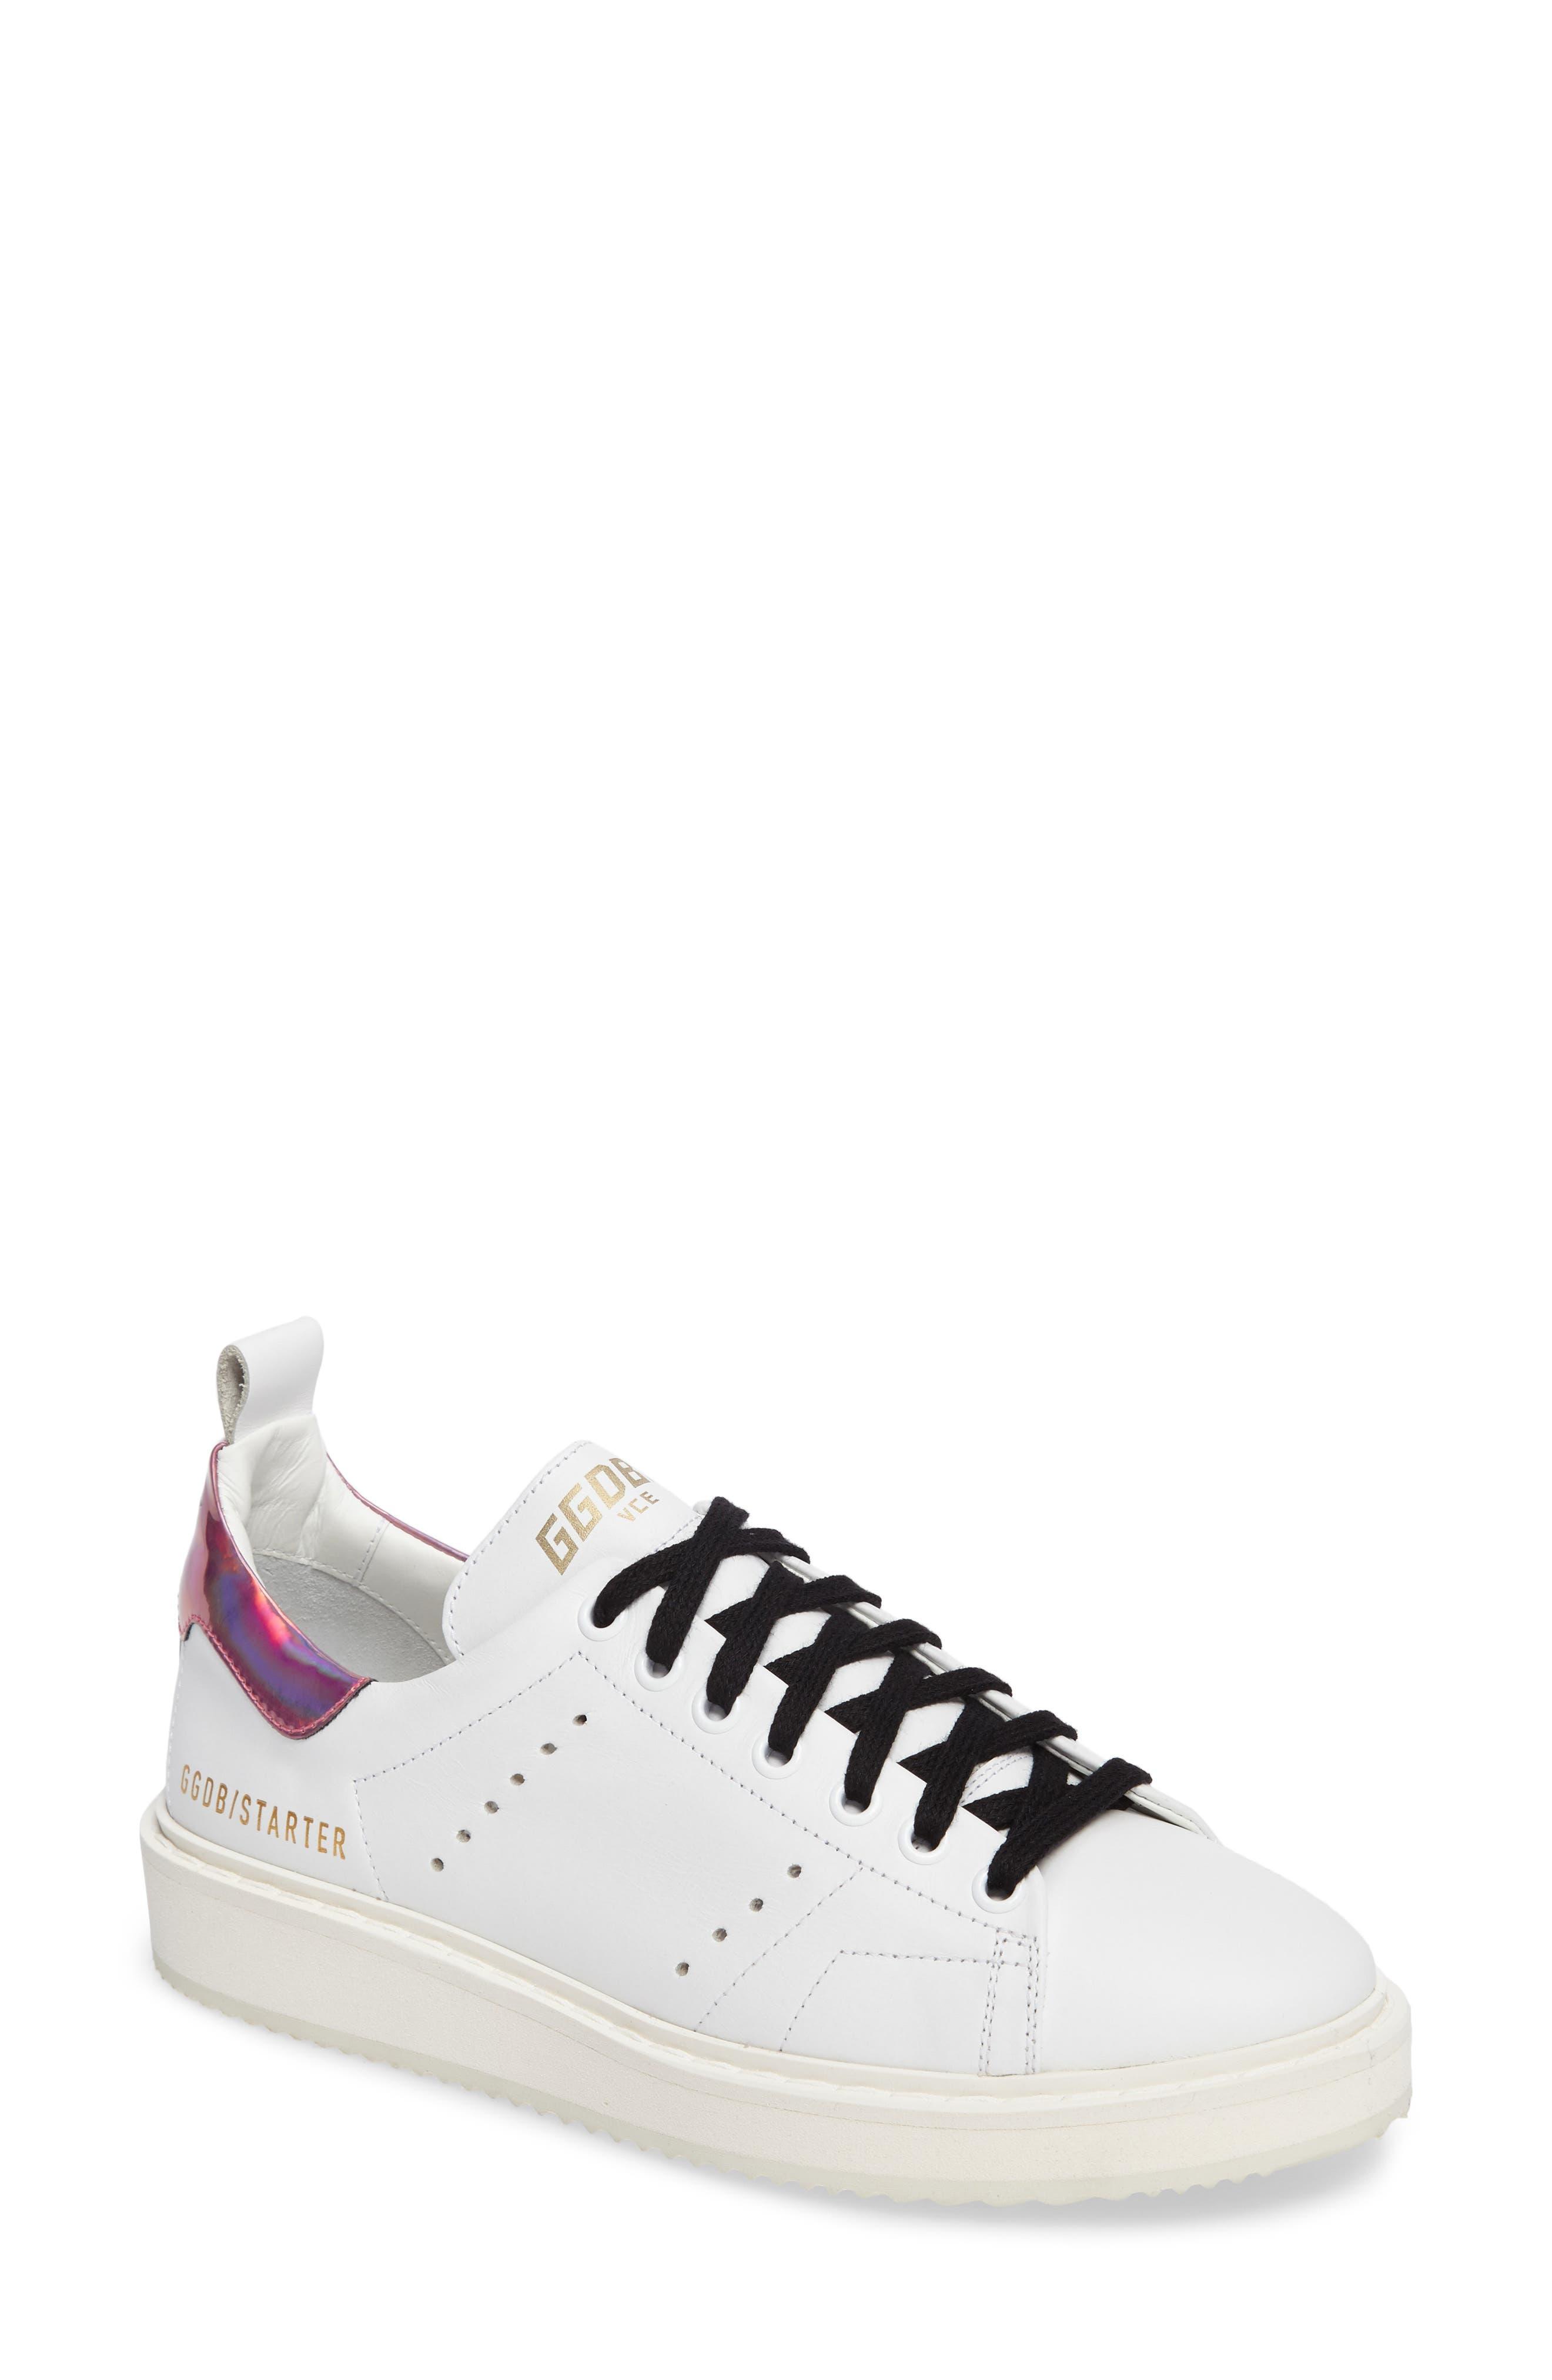 Alternate Image 1 Selected - Golden Goose Starter Low Top Sneaker (Women)